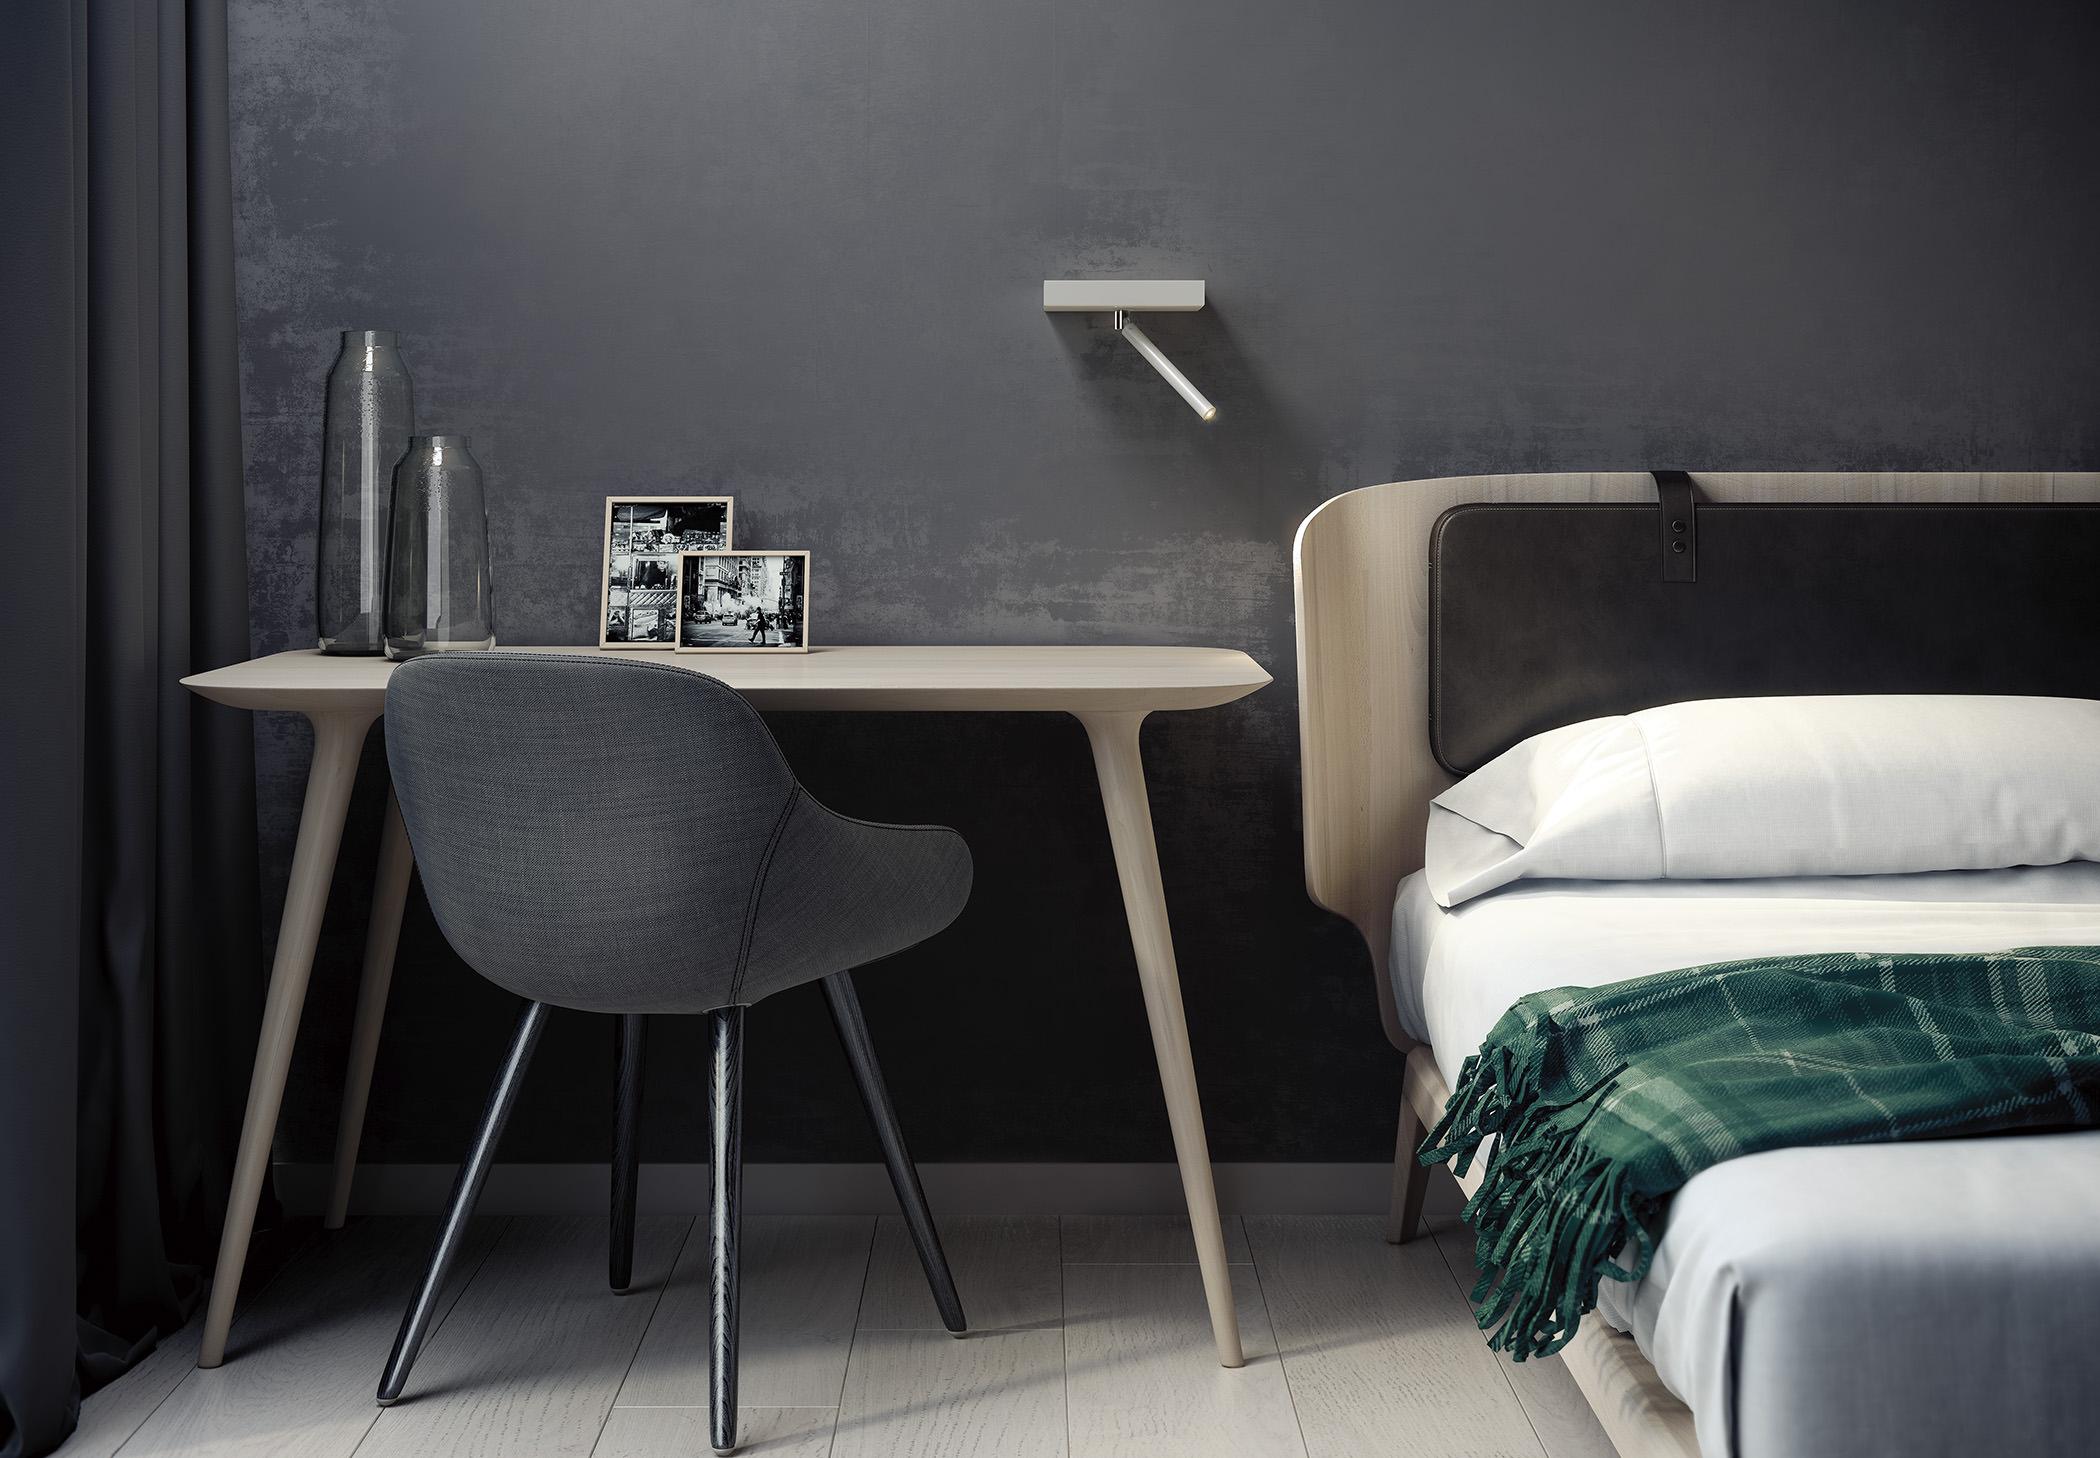 Nit A 3520 Wall Lamp Estiluz Image Ambient 01 1